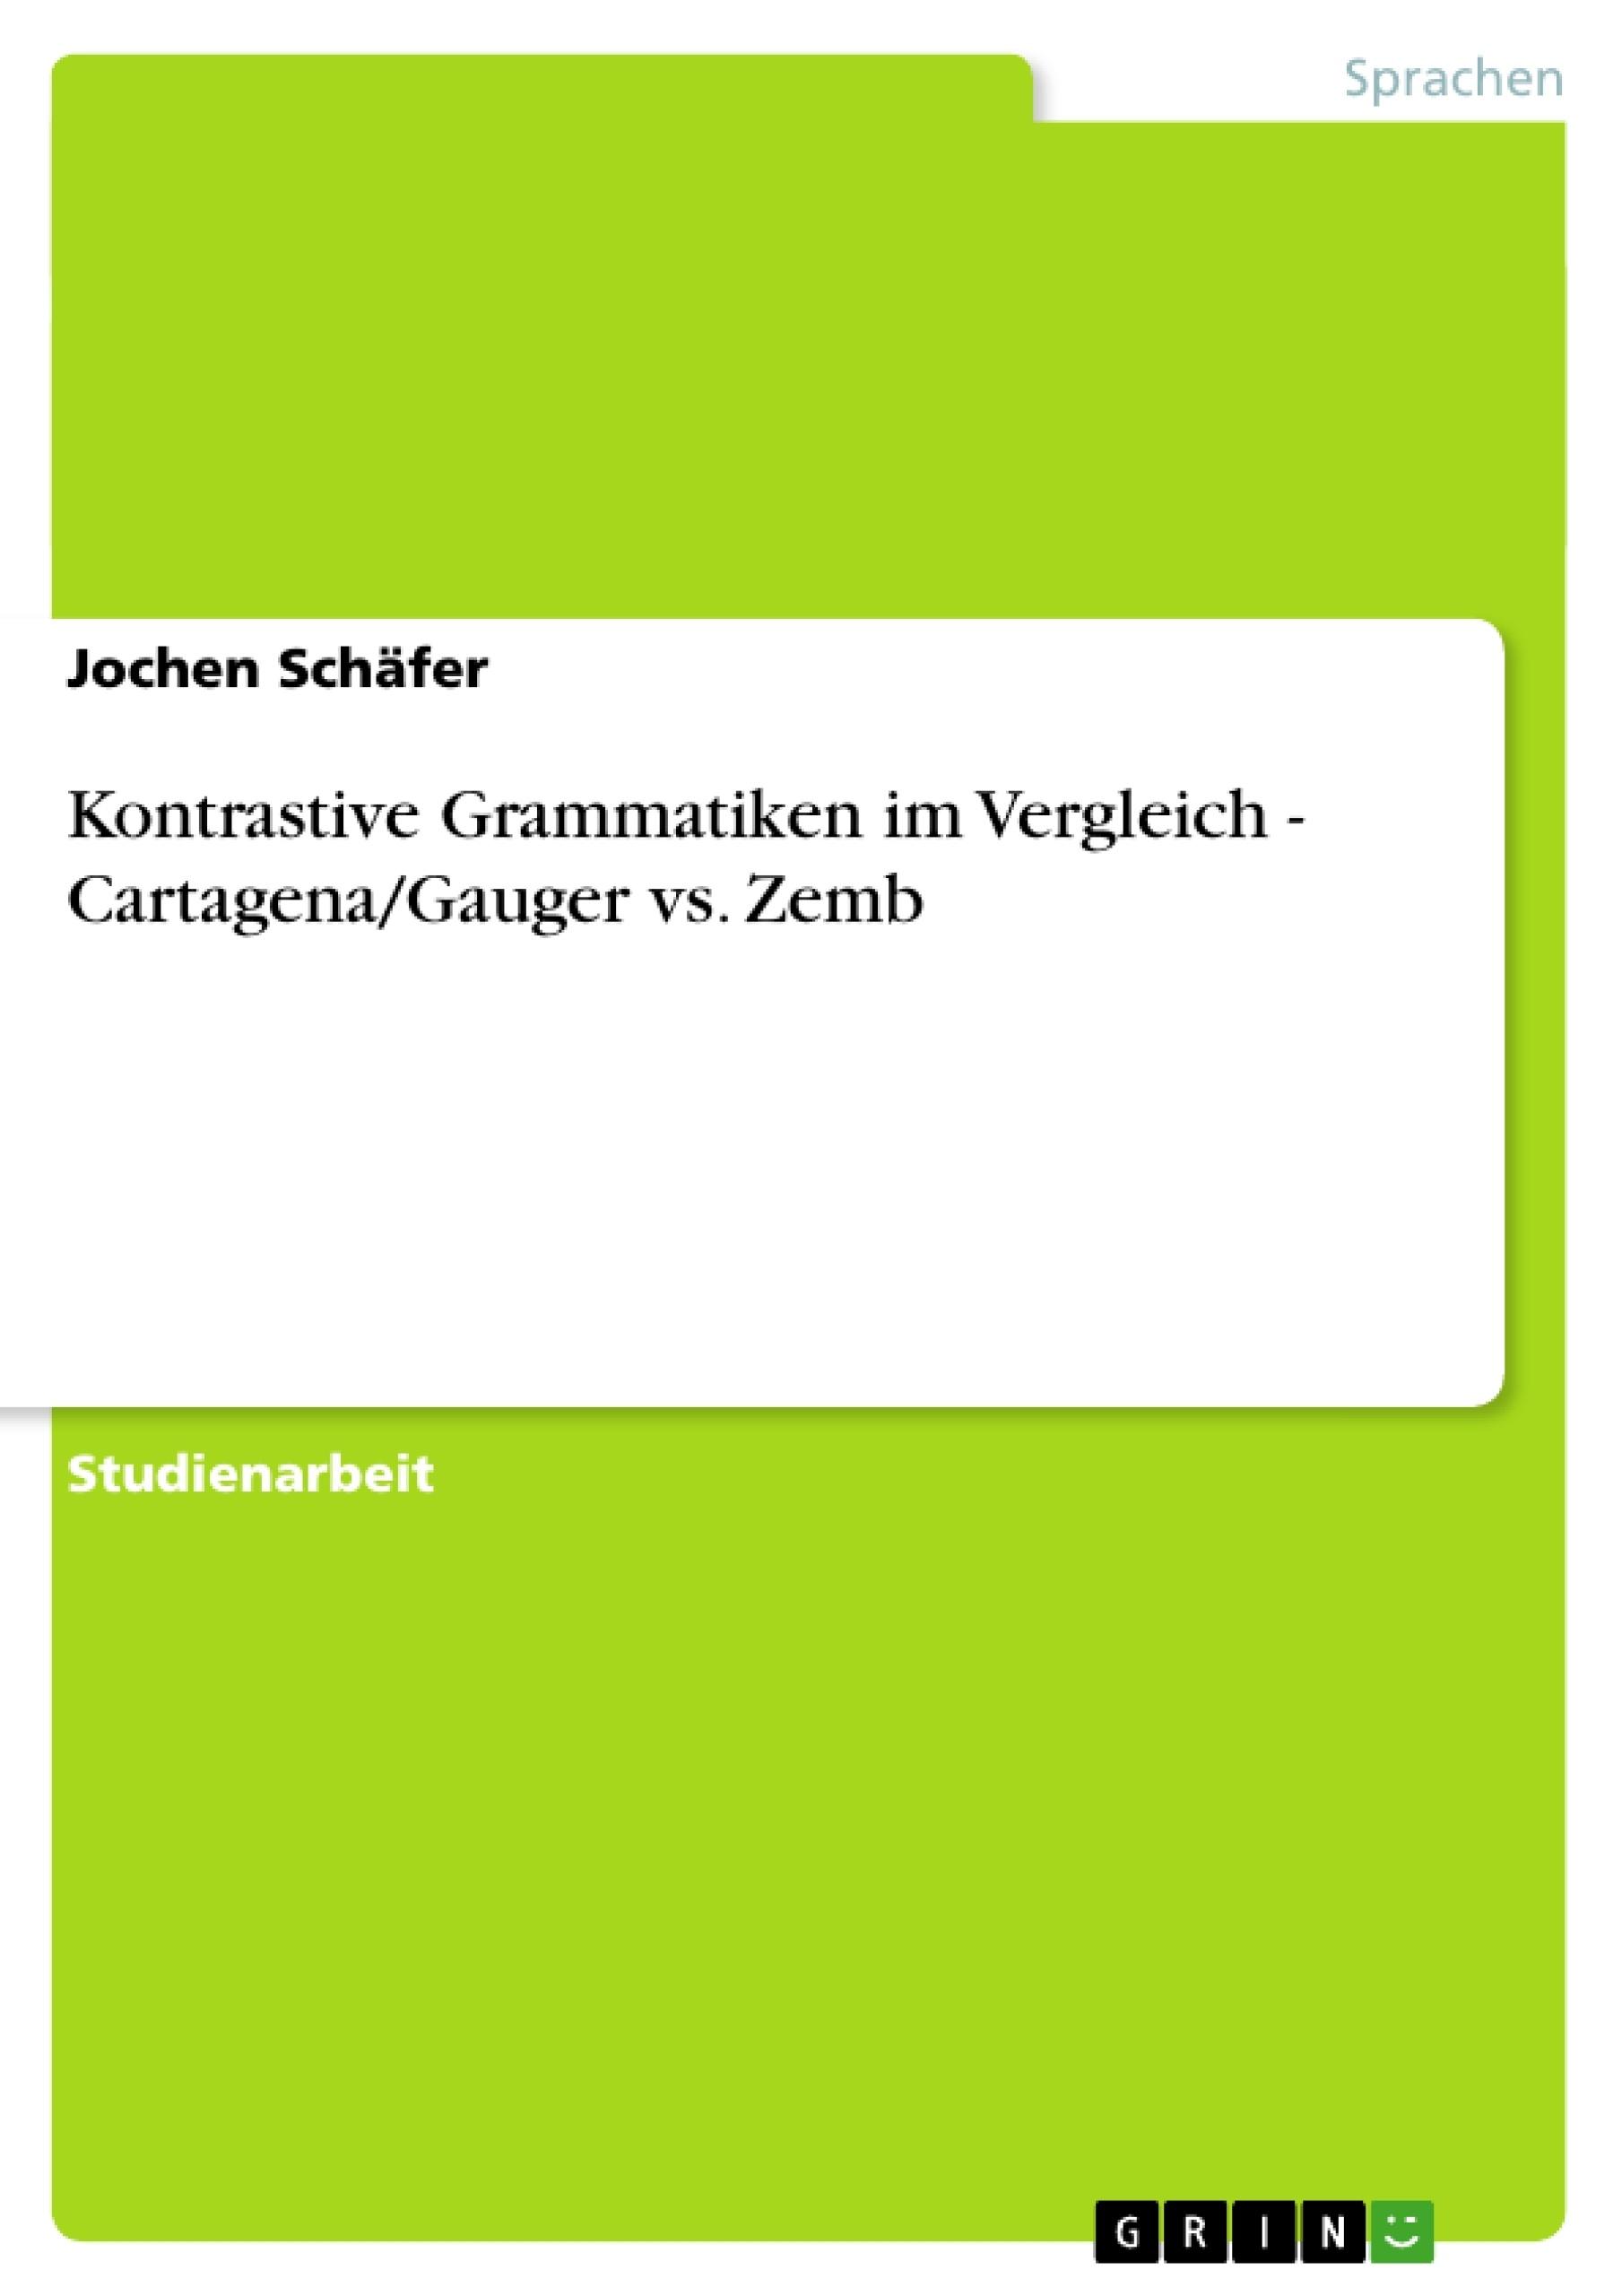 Titel: Kontrastive Grammatiken im Vergleich - Cartagena/Gauger vs. Zemb